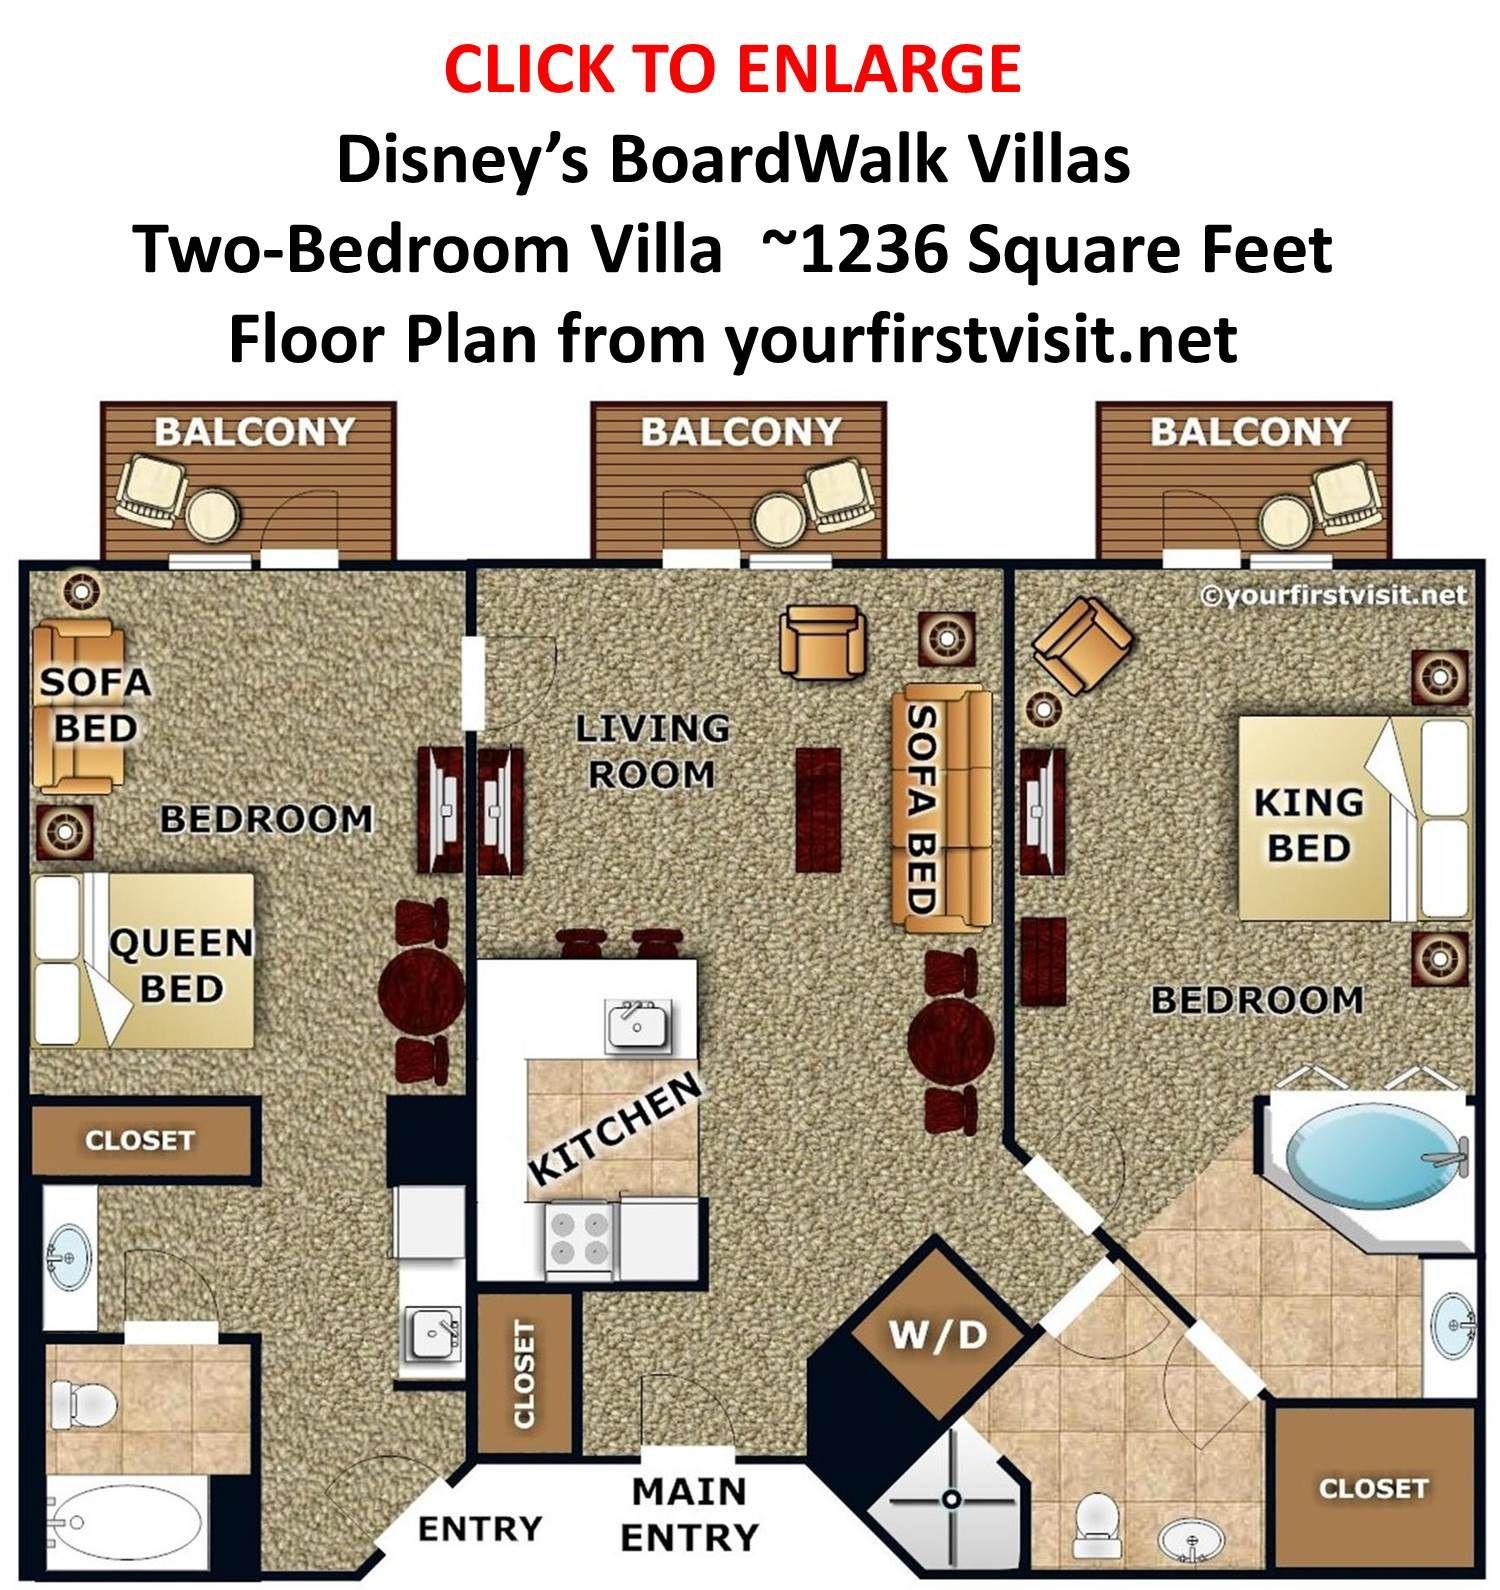 Disney s BoardWalk Villas Two Bedroom Villa Floor Plan from  yourfirstvisit net. Photo Tour of the Master Bedroom and Baths of a One Bedroom Villa